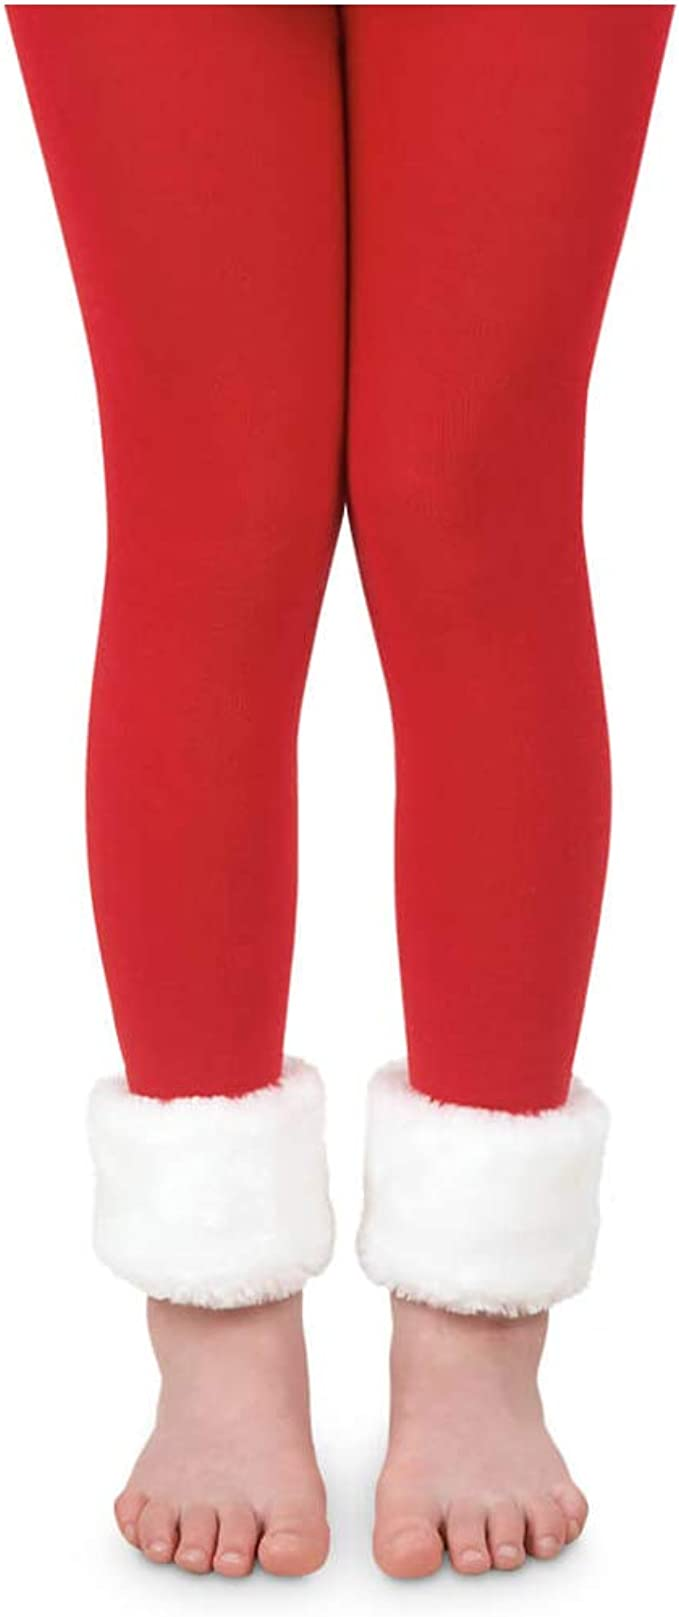 Jefferies Socks Girls Holiday Christmas Stripe Pattern Fashion Novelty Tights 1 Pack